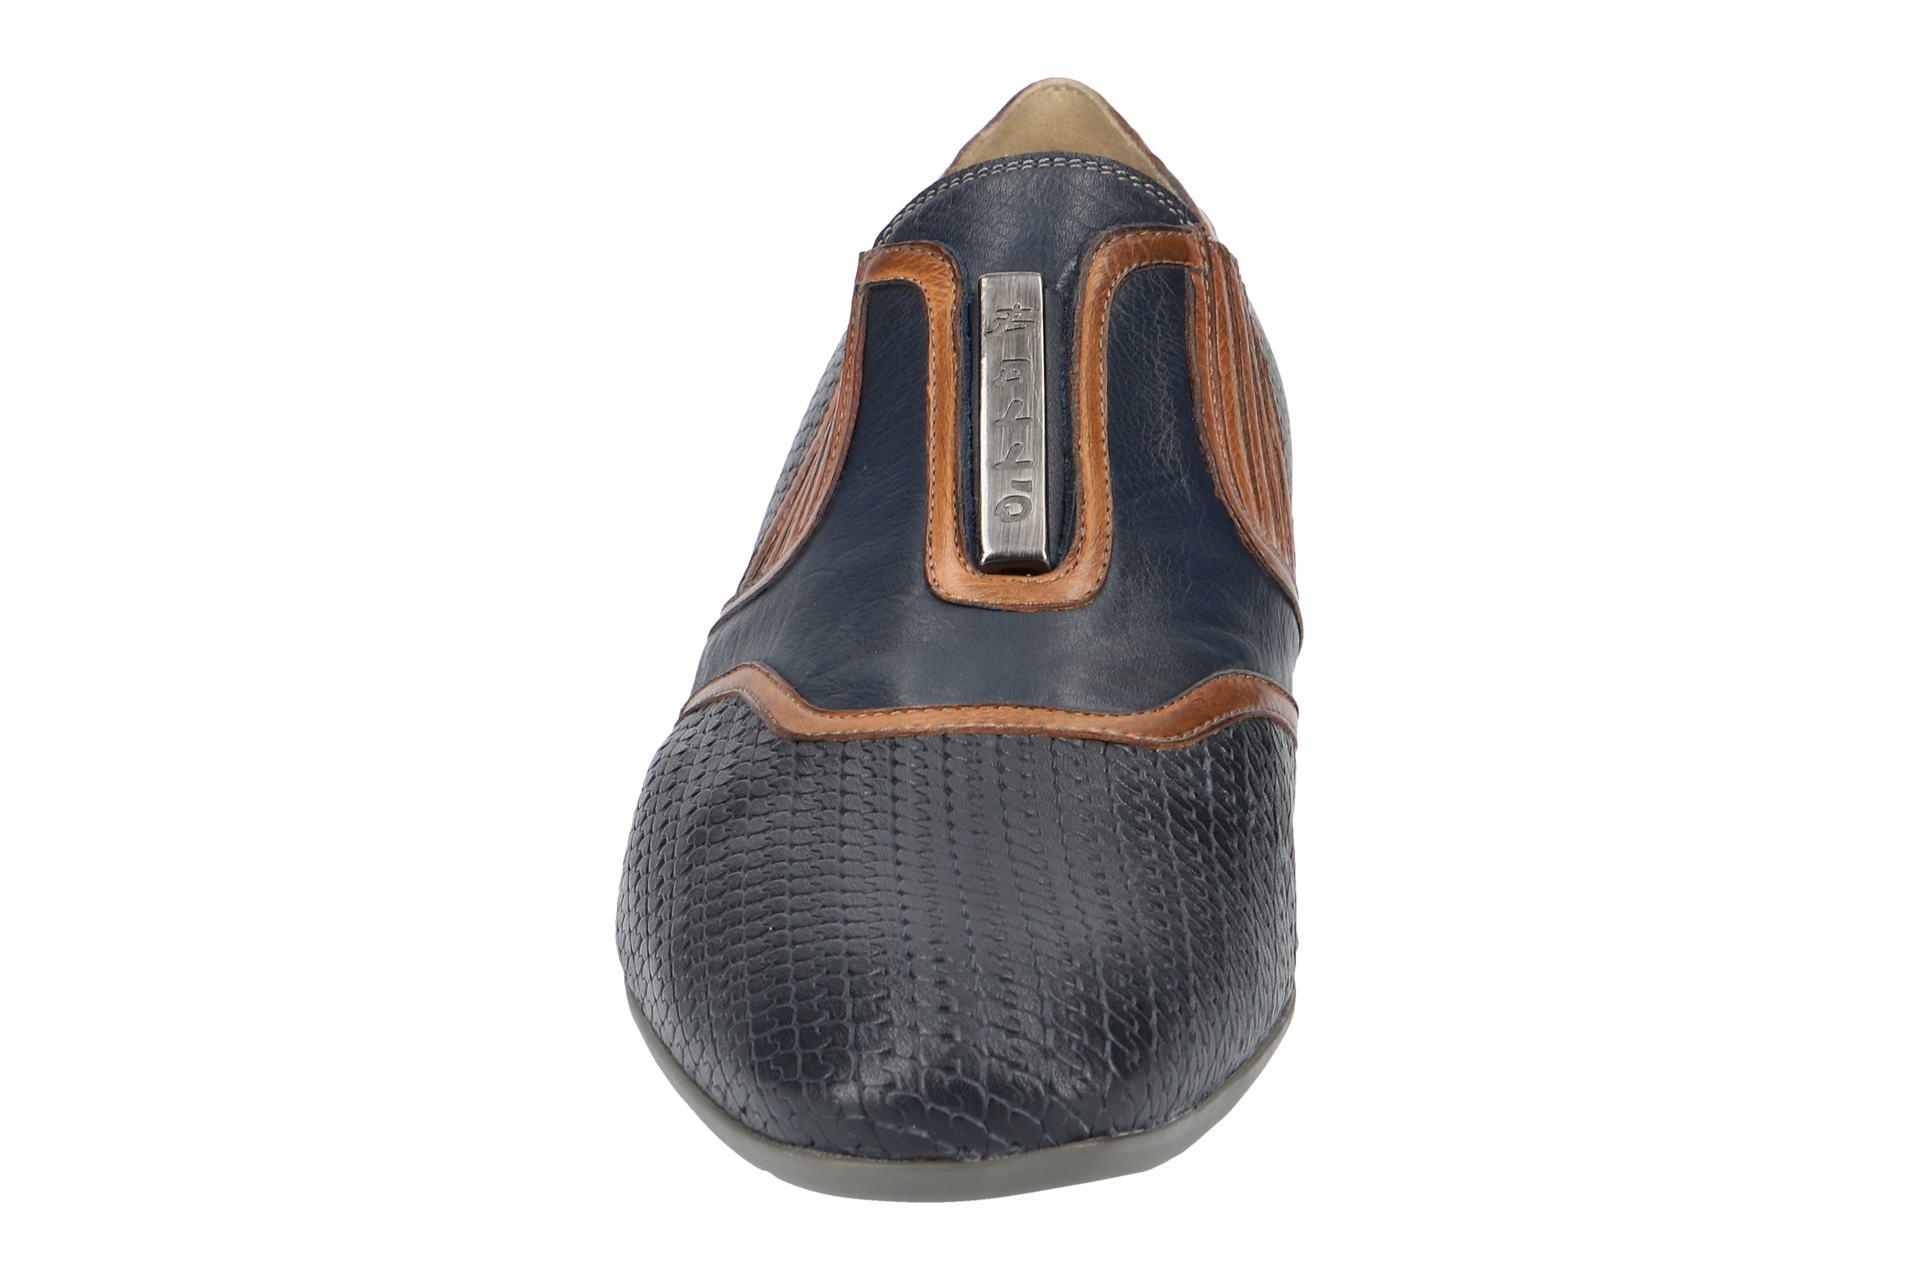 Slipper Bl308 Elegante Herrenschuhe Zu Neu Bello Blau Schuhe Navy Details yf67gYb